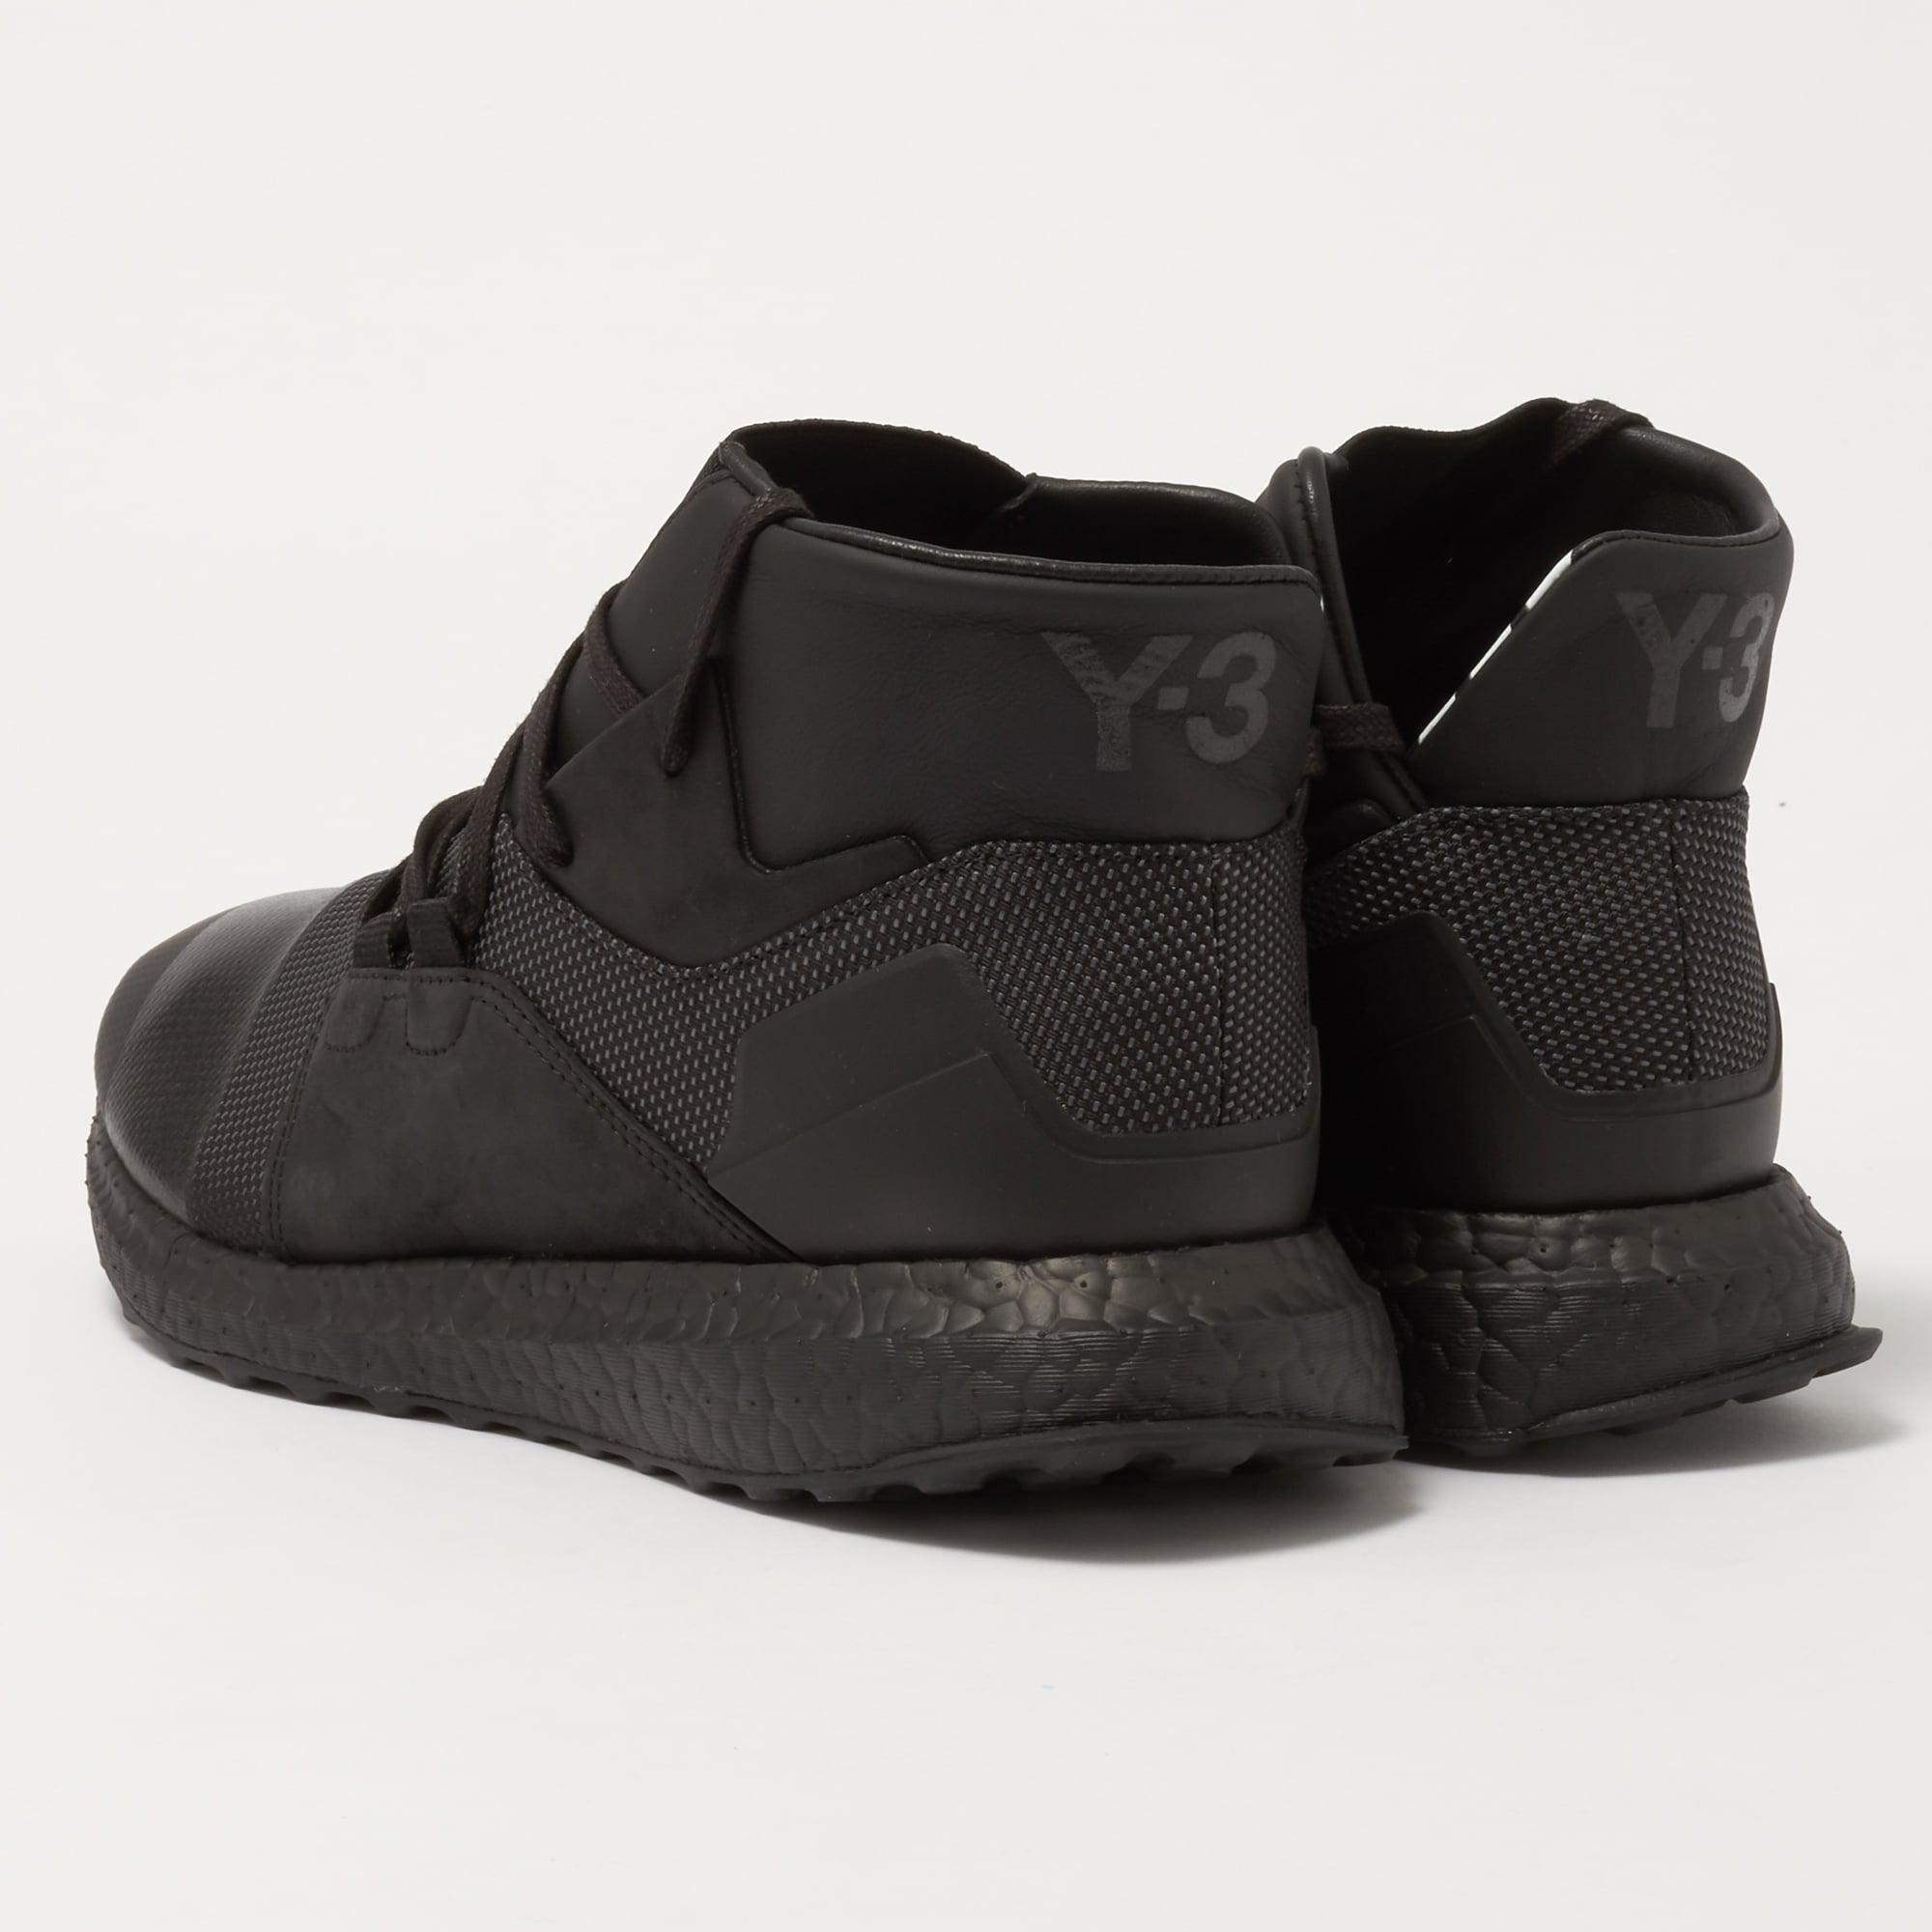 34b601006e6a6 Y-3 Kozoko High - Core Black in Black for Men - Lyst